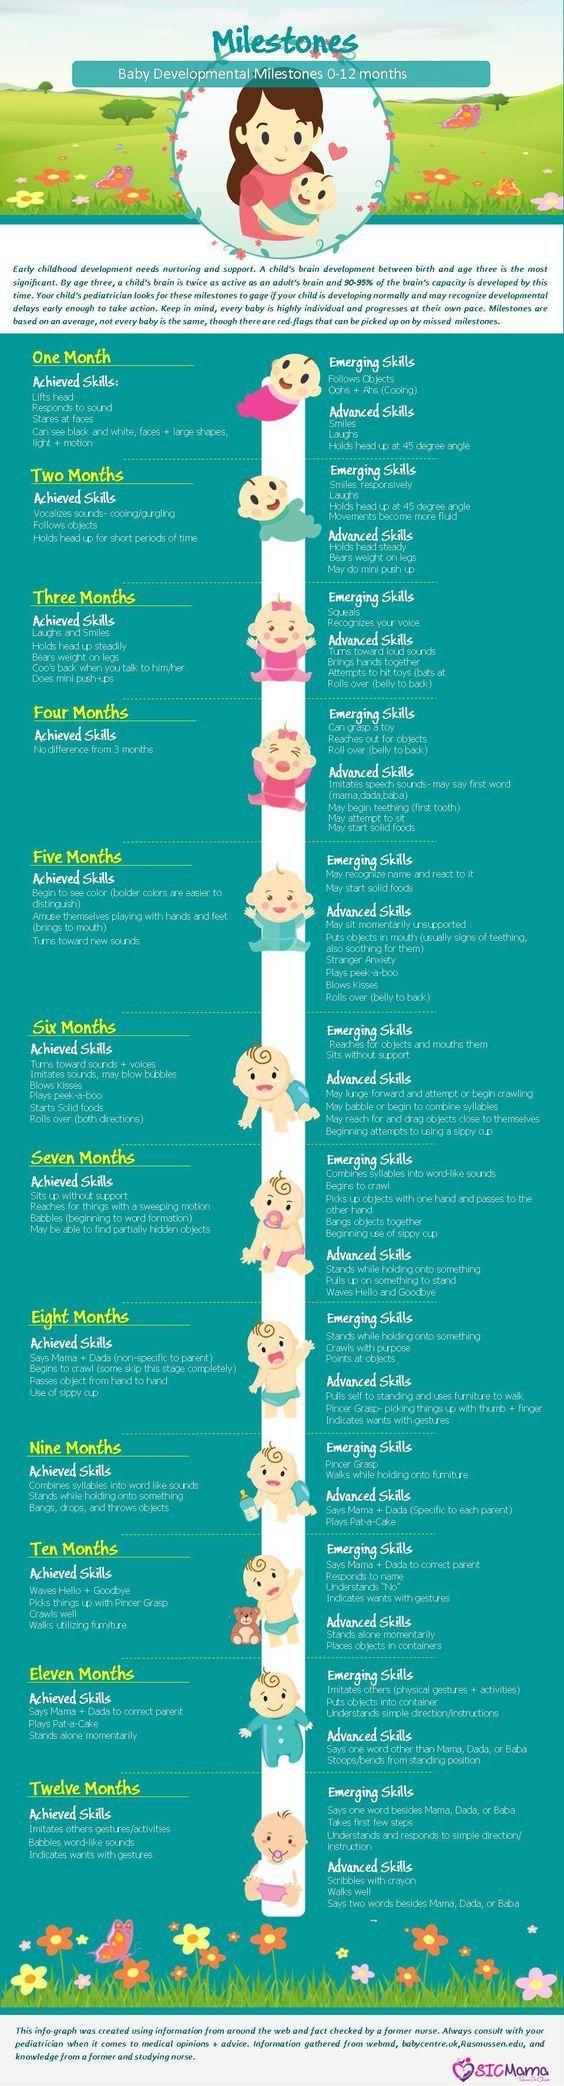 Baby Milestones Growth Development 0 12 Months Free Keepsake Tracker Insid Baby Milestones Baby Development Baby Growth